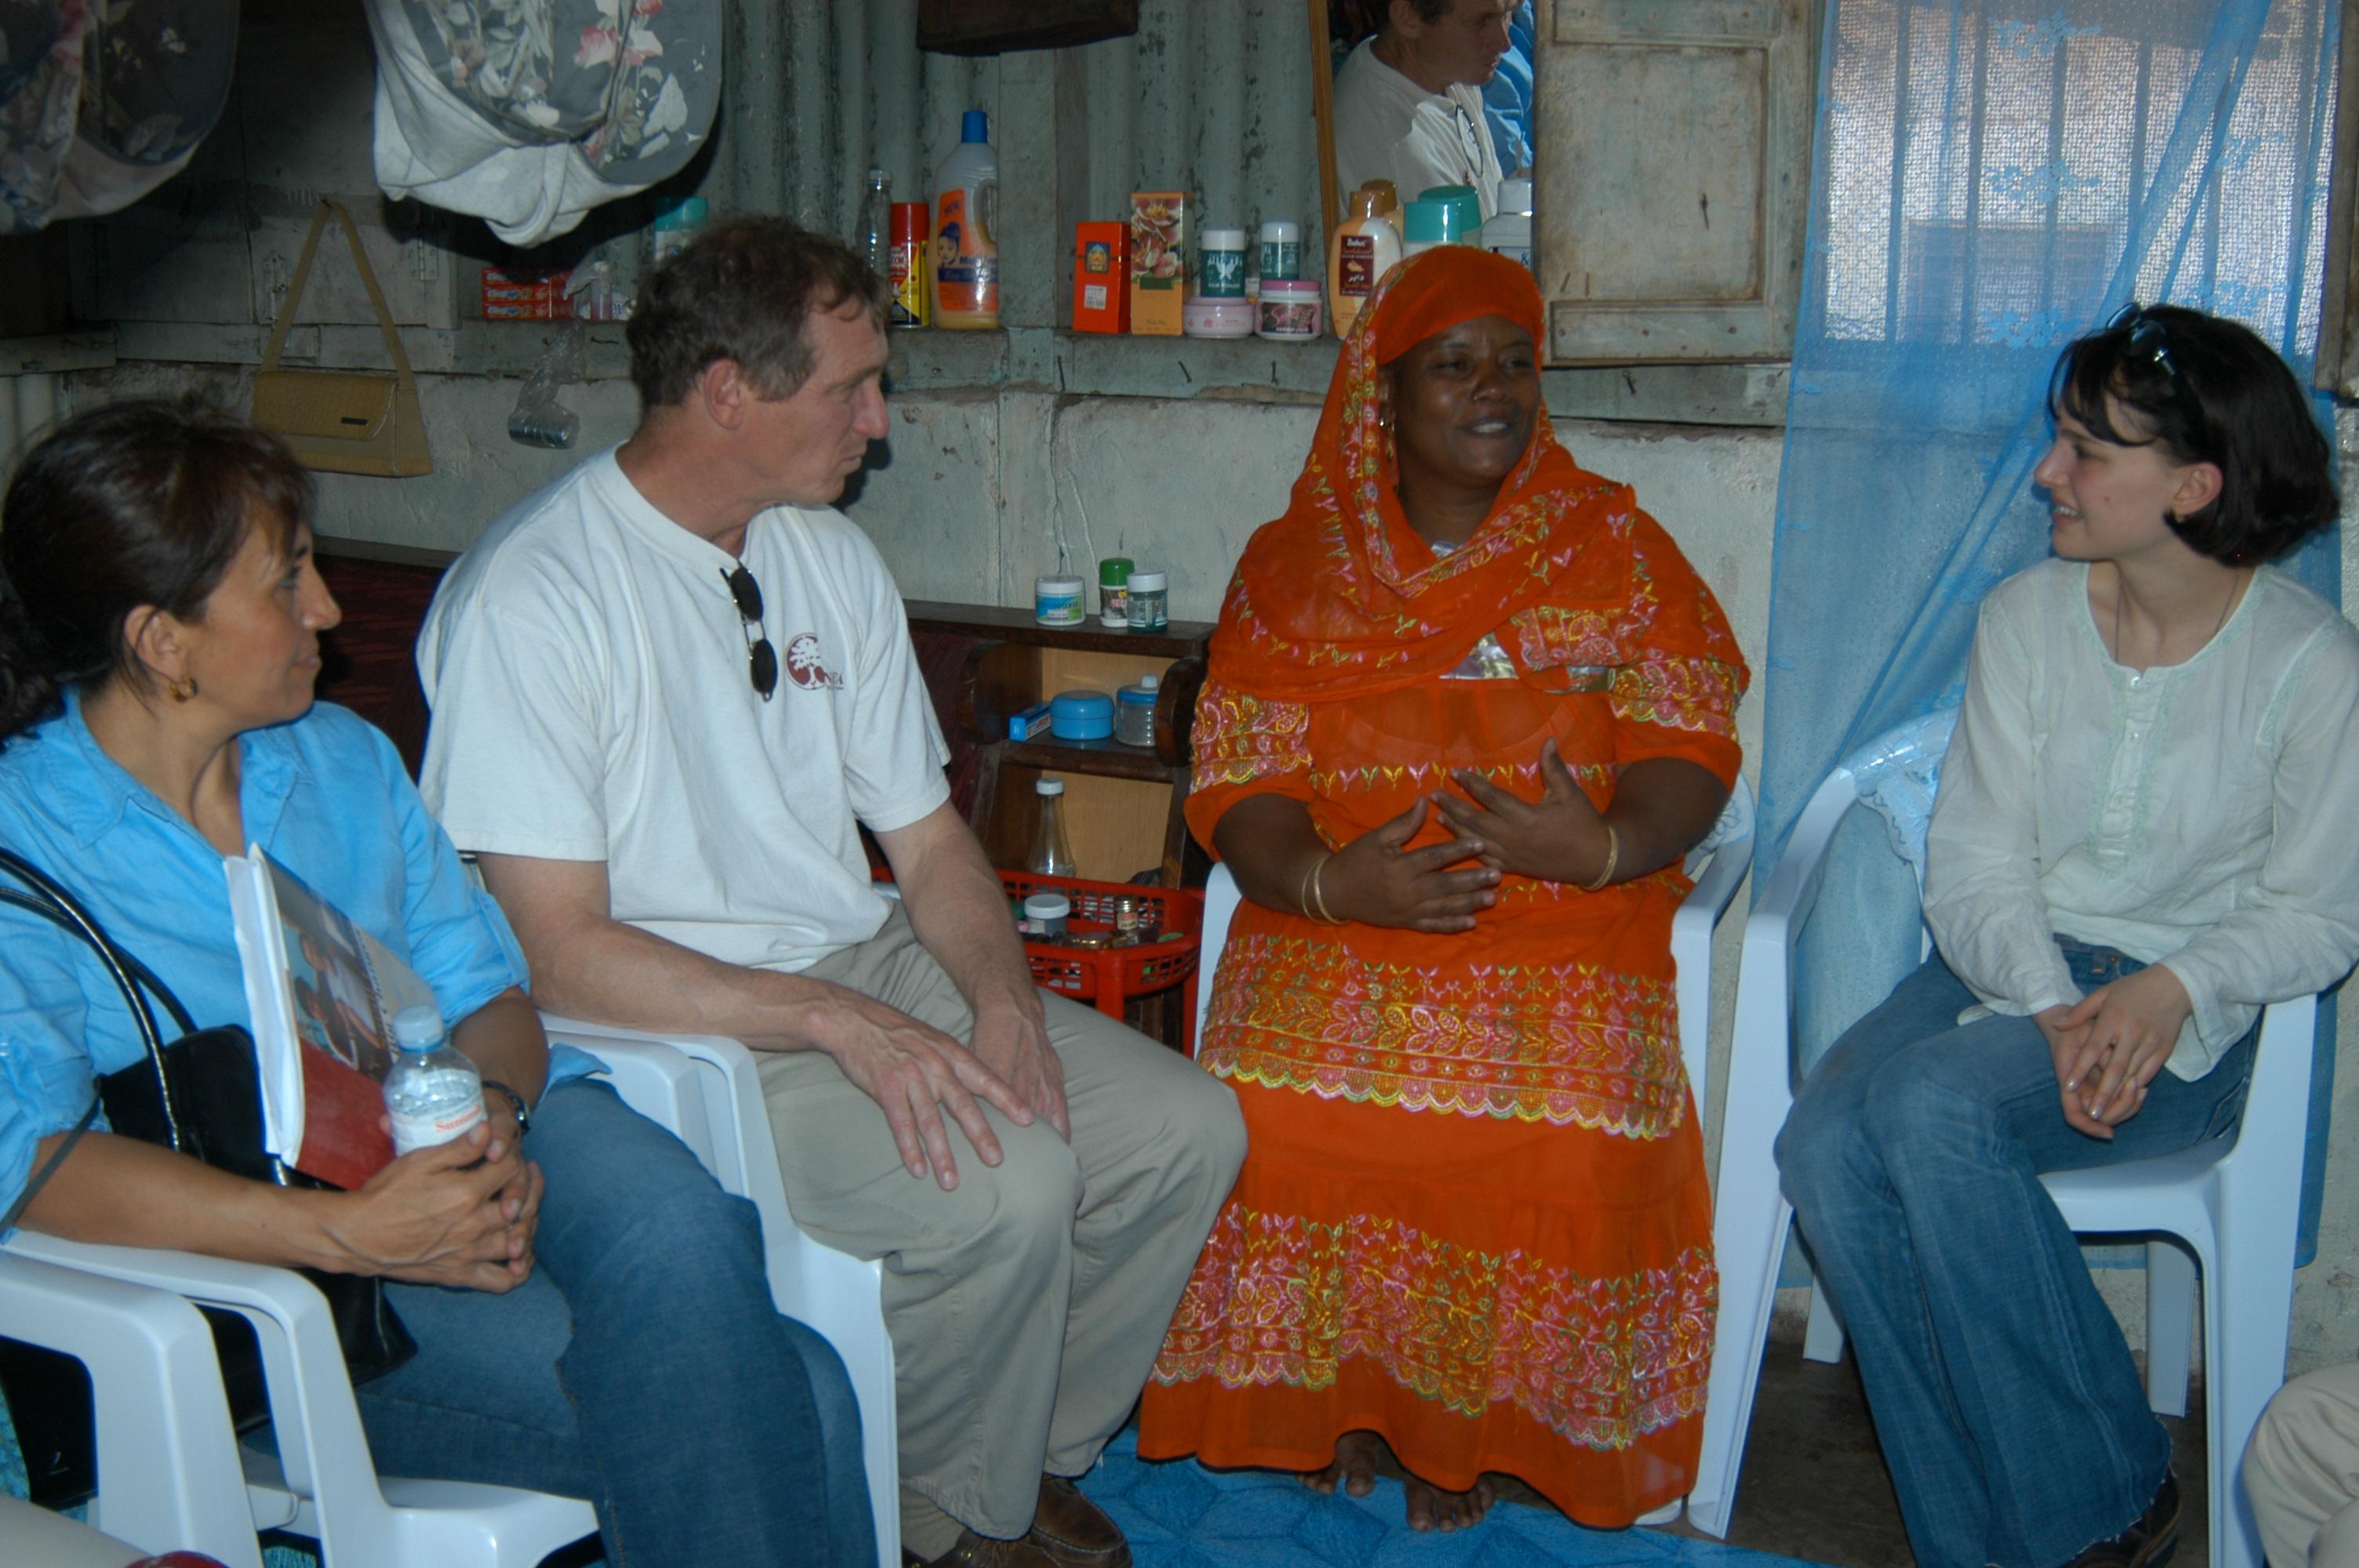 Rupert + Natalie + Nayima+Soledad